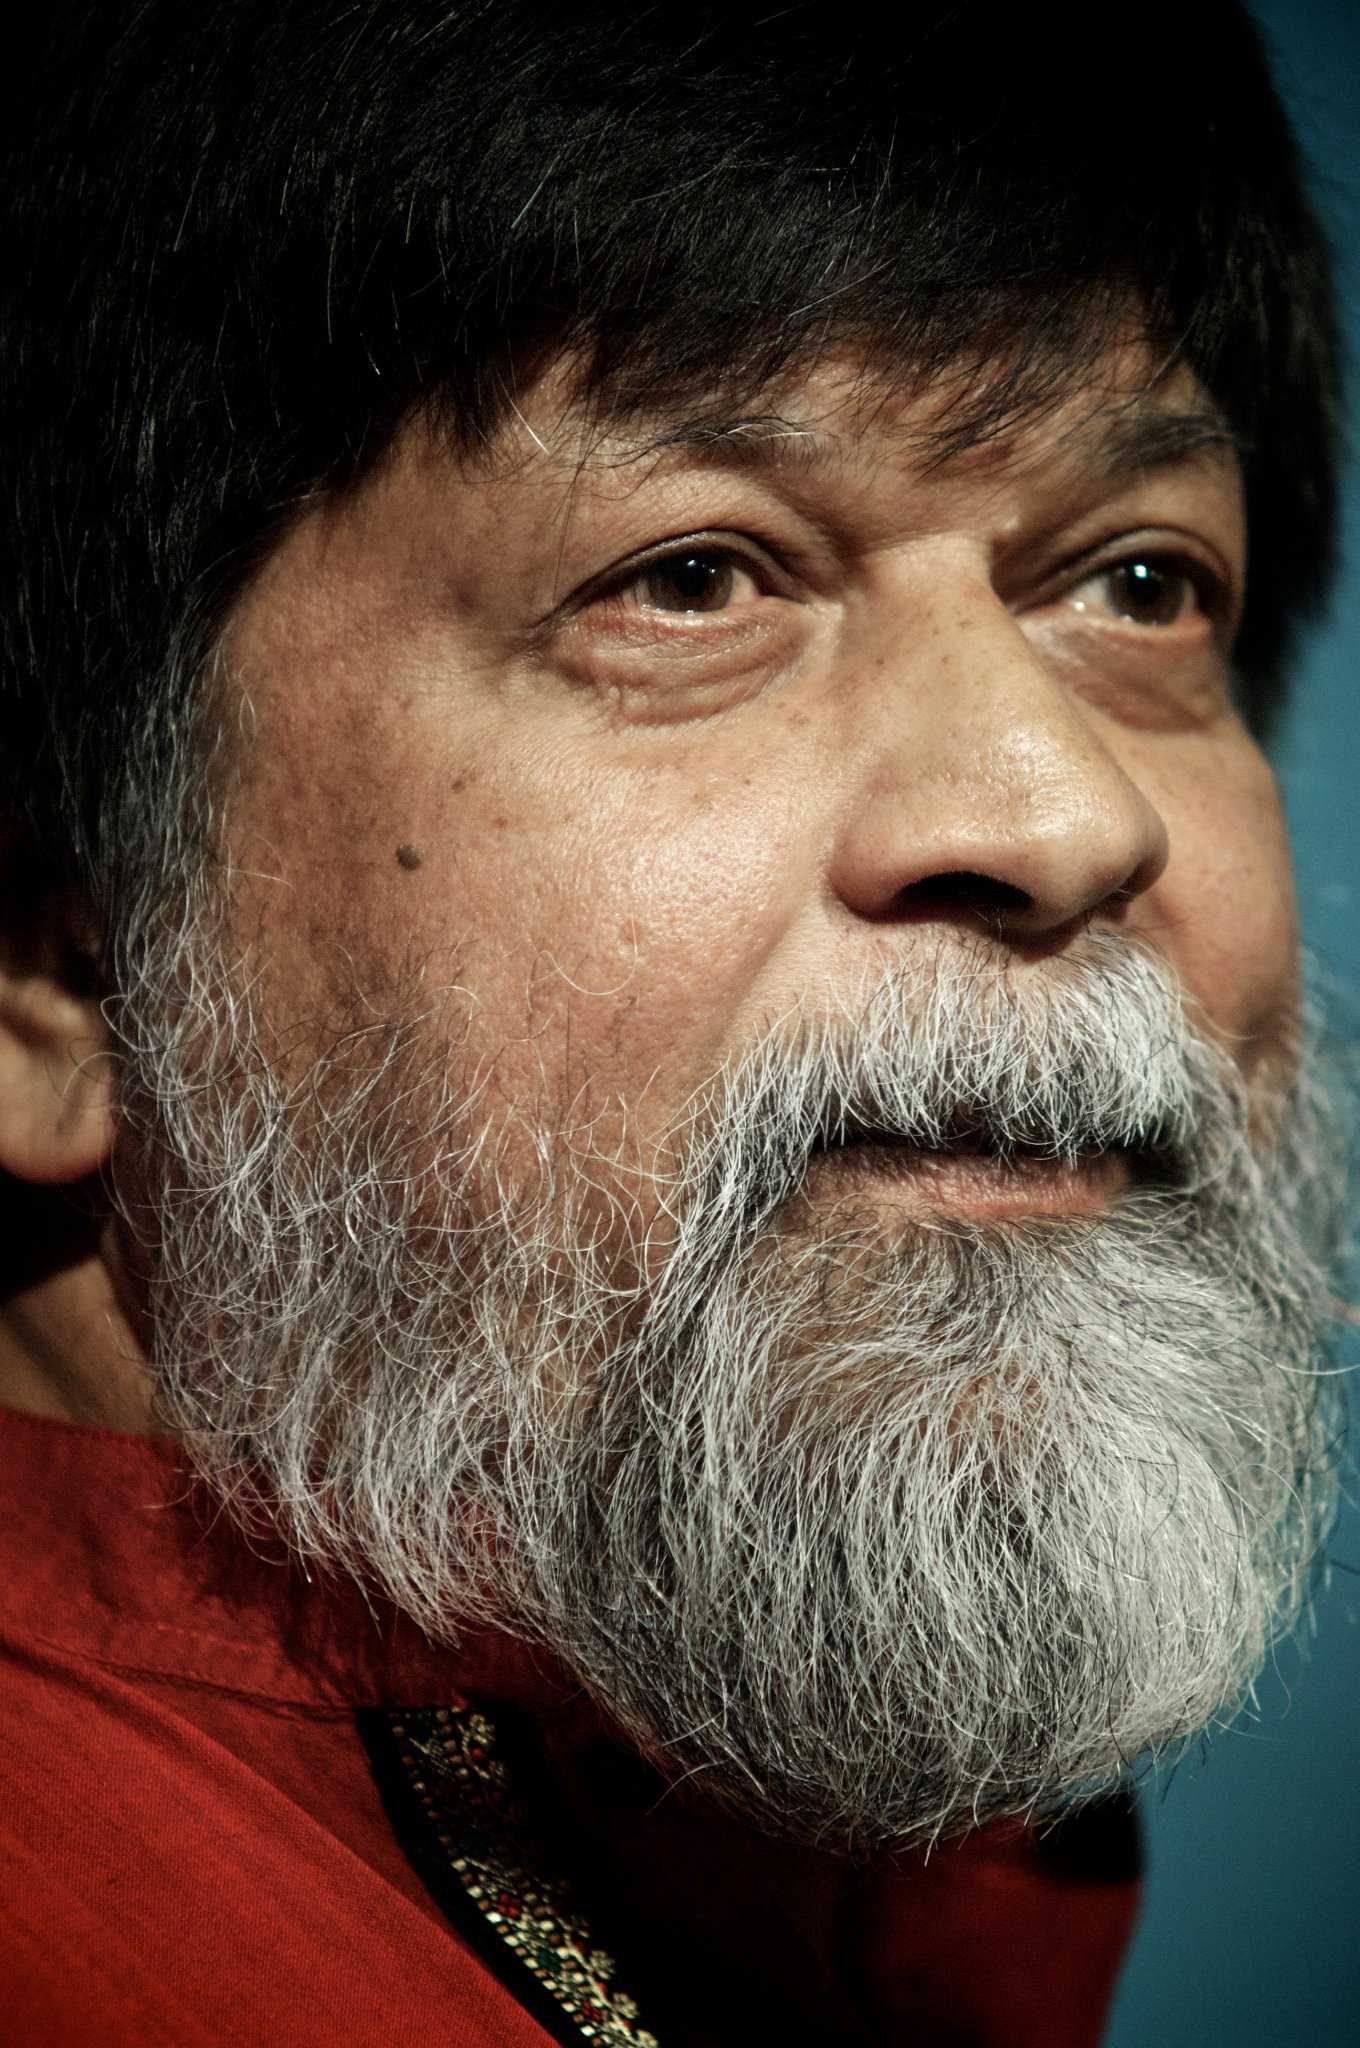 Shahidul Alam , via Wikimedia Commons